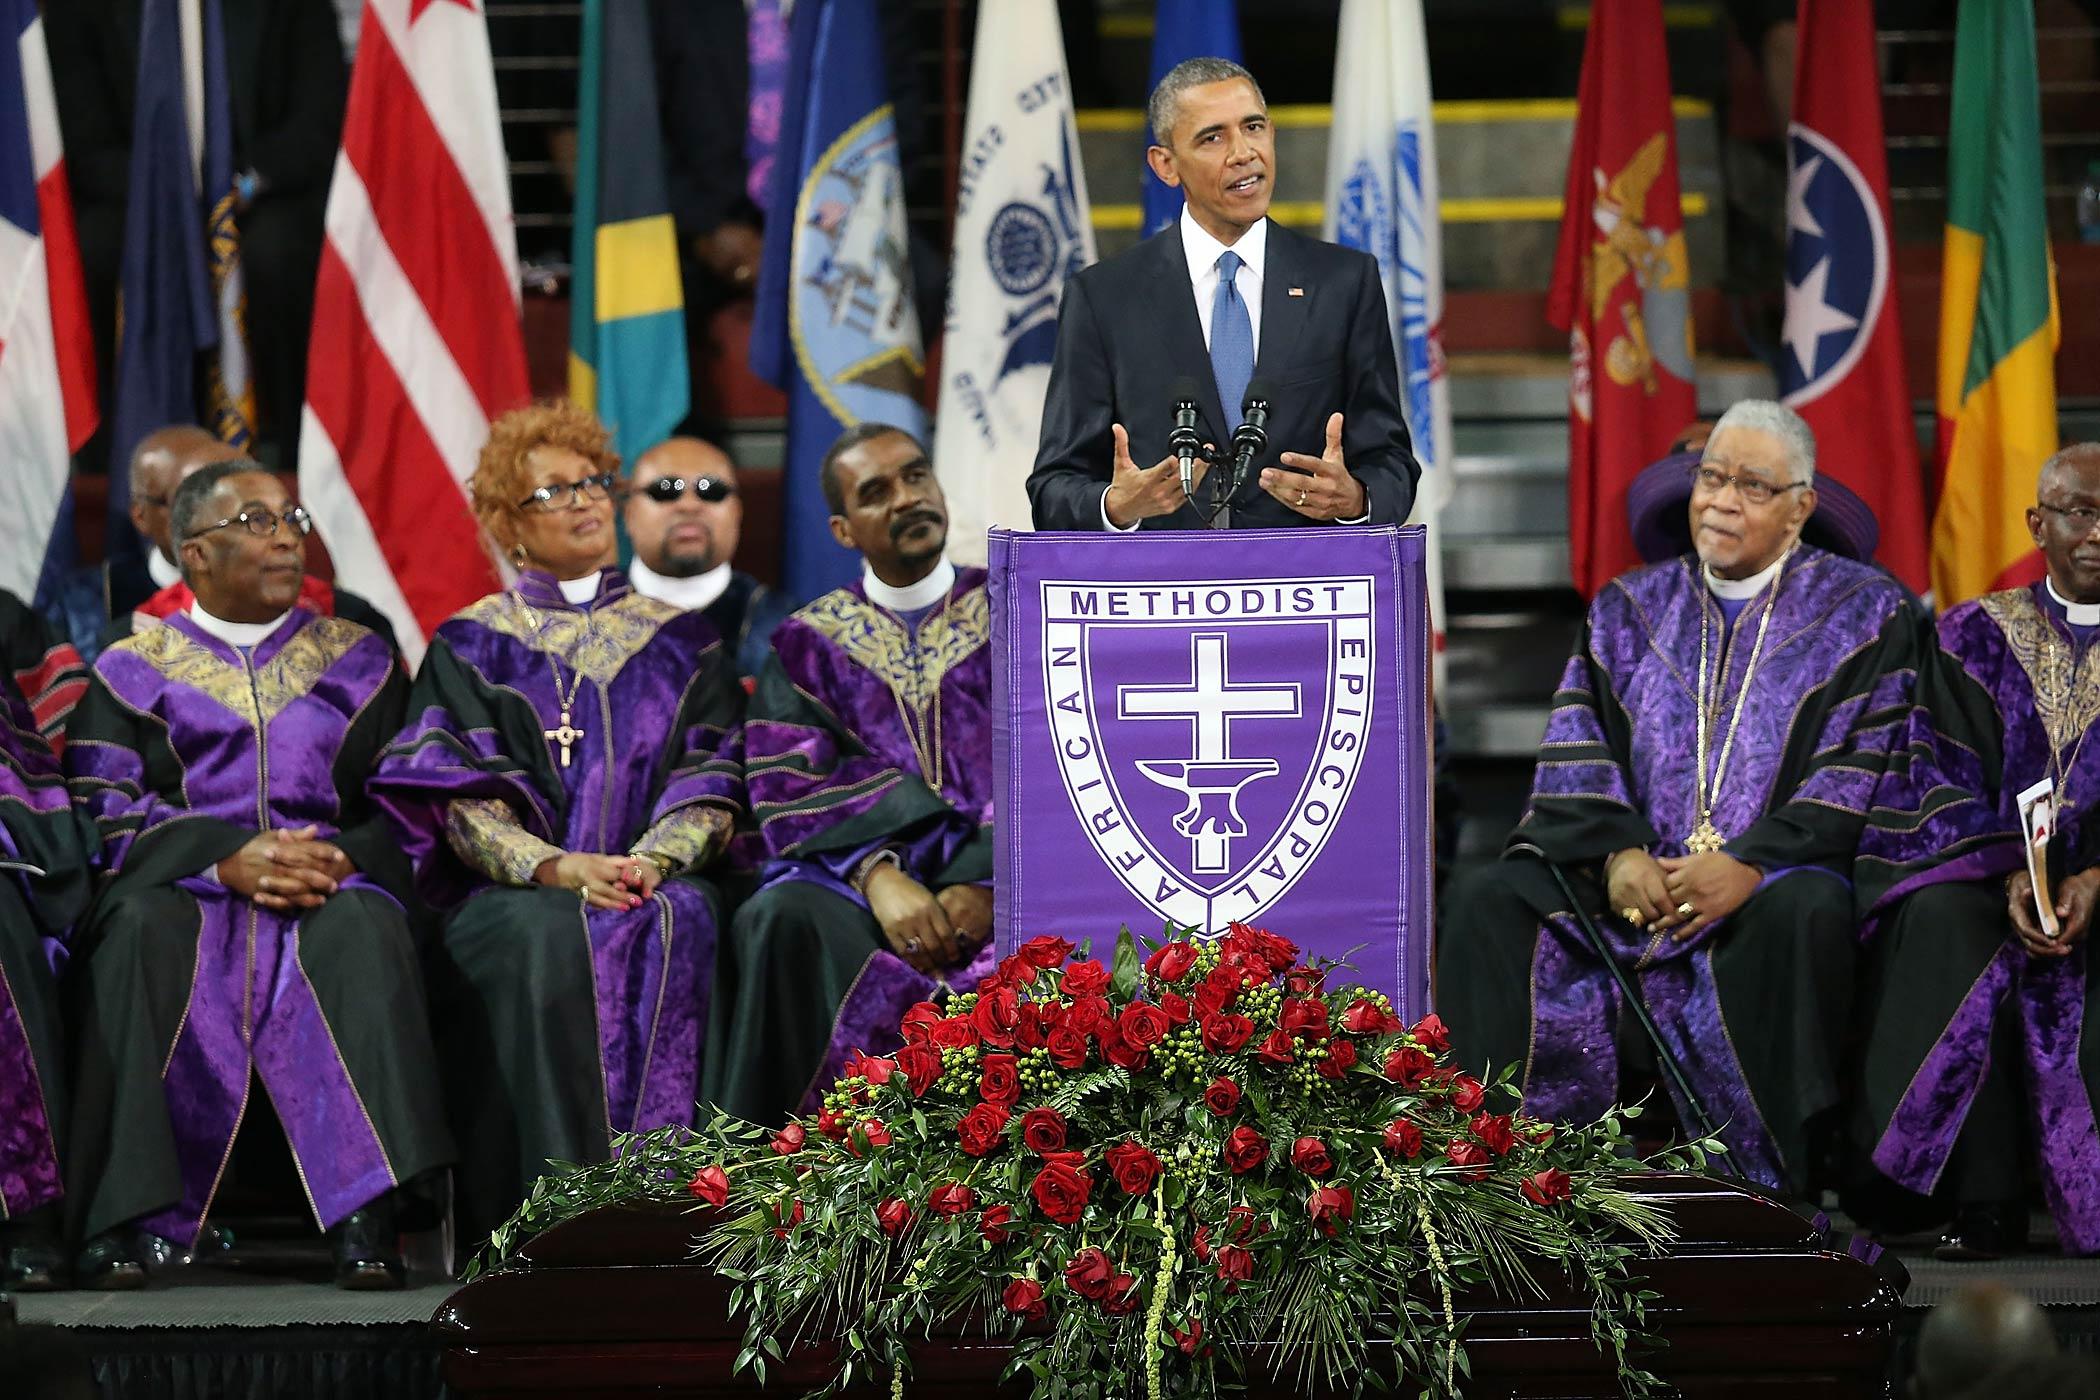 President Barack Obama delivers the eulogy for South Carolina state senator and Rev. Clementa Pinckney during Pinckney's funeral service on June 26, 2015 in Charleston, S.C.